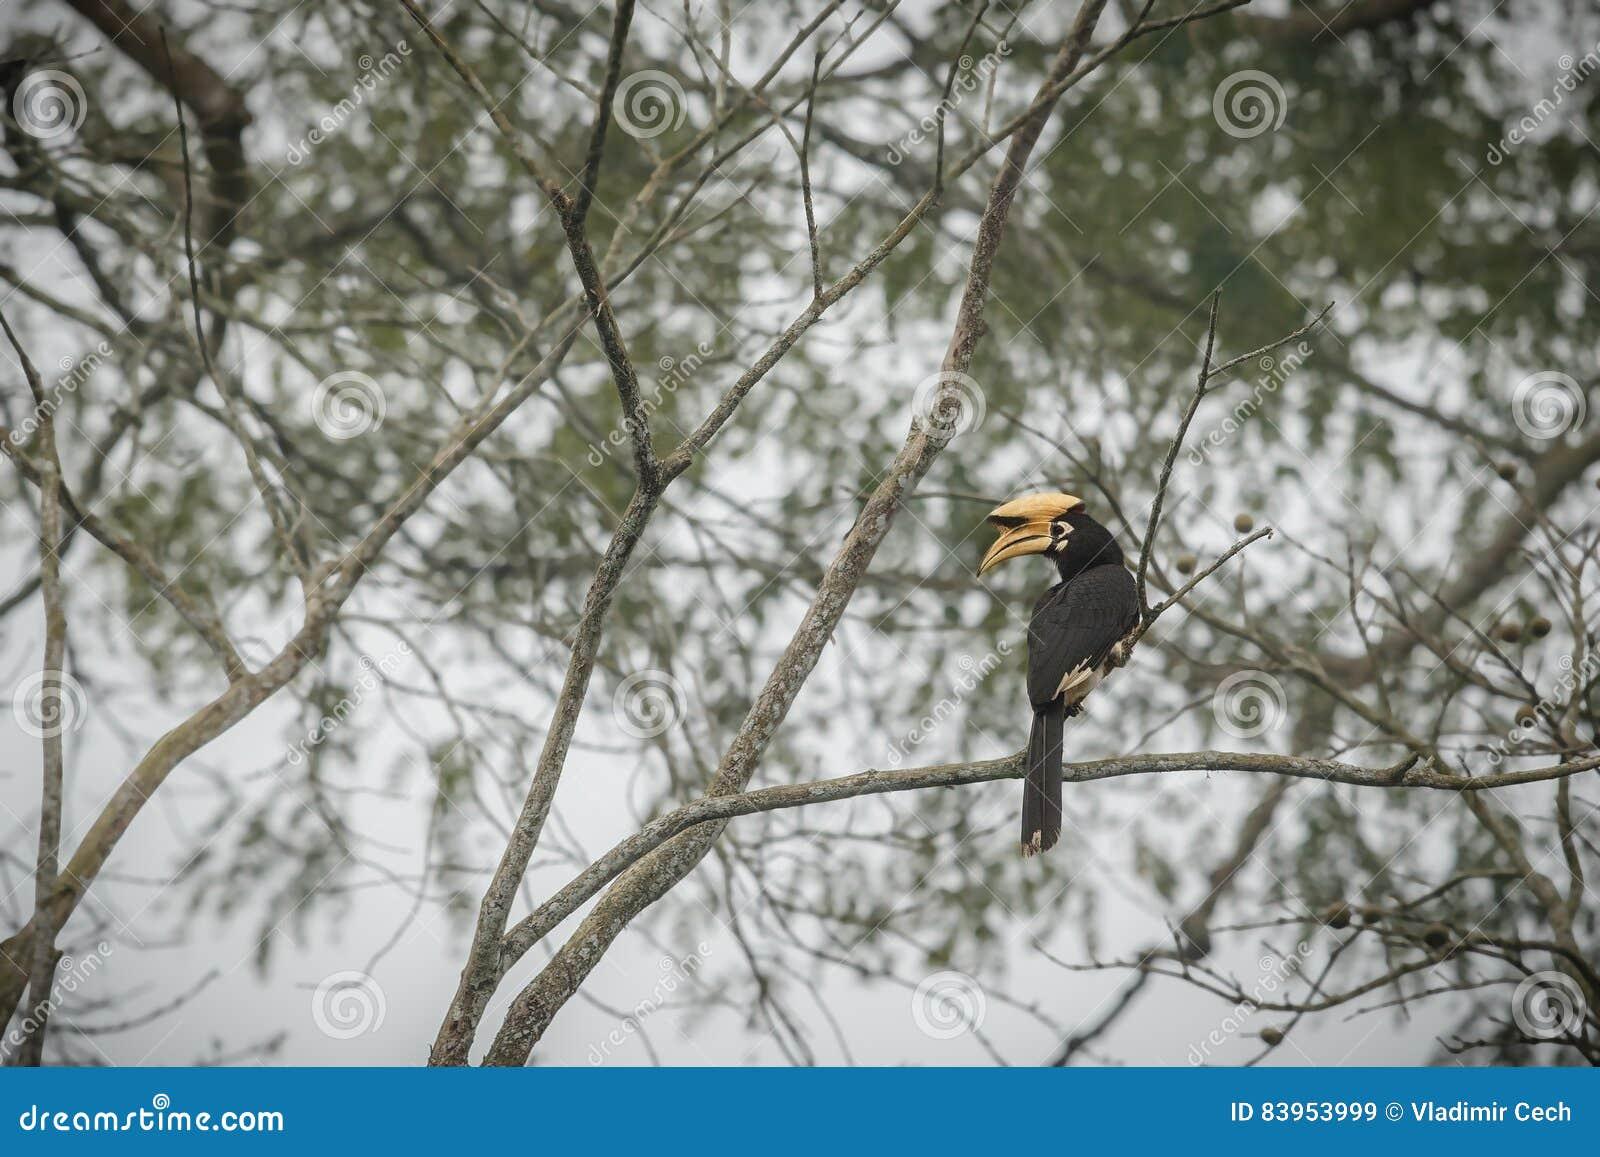 Beautiful big bird hornbill on a tree in Kaziranga, India